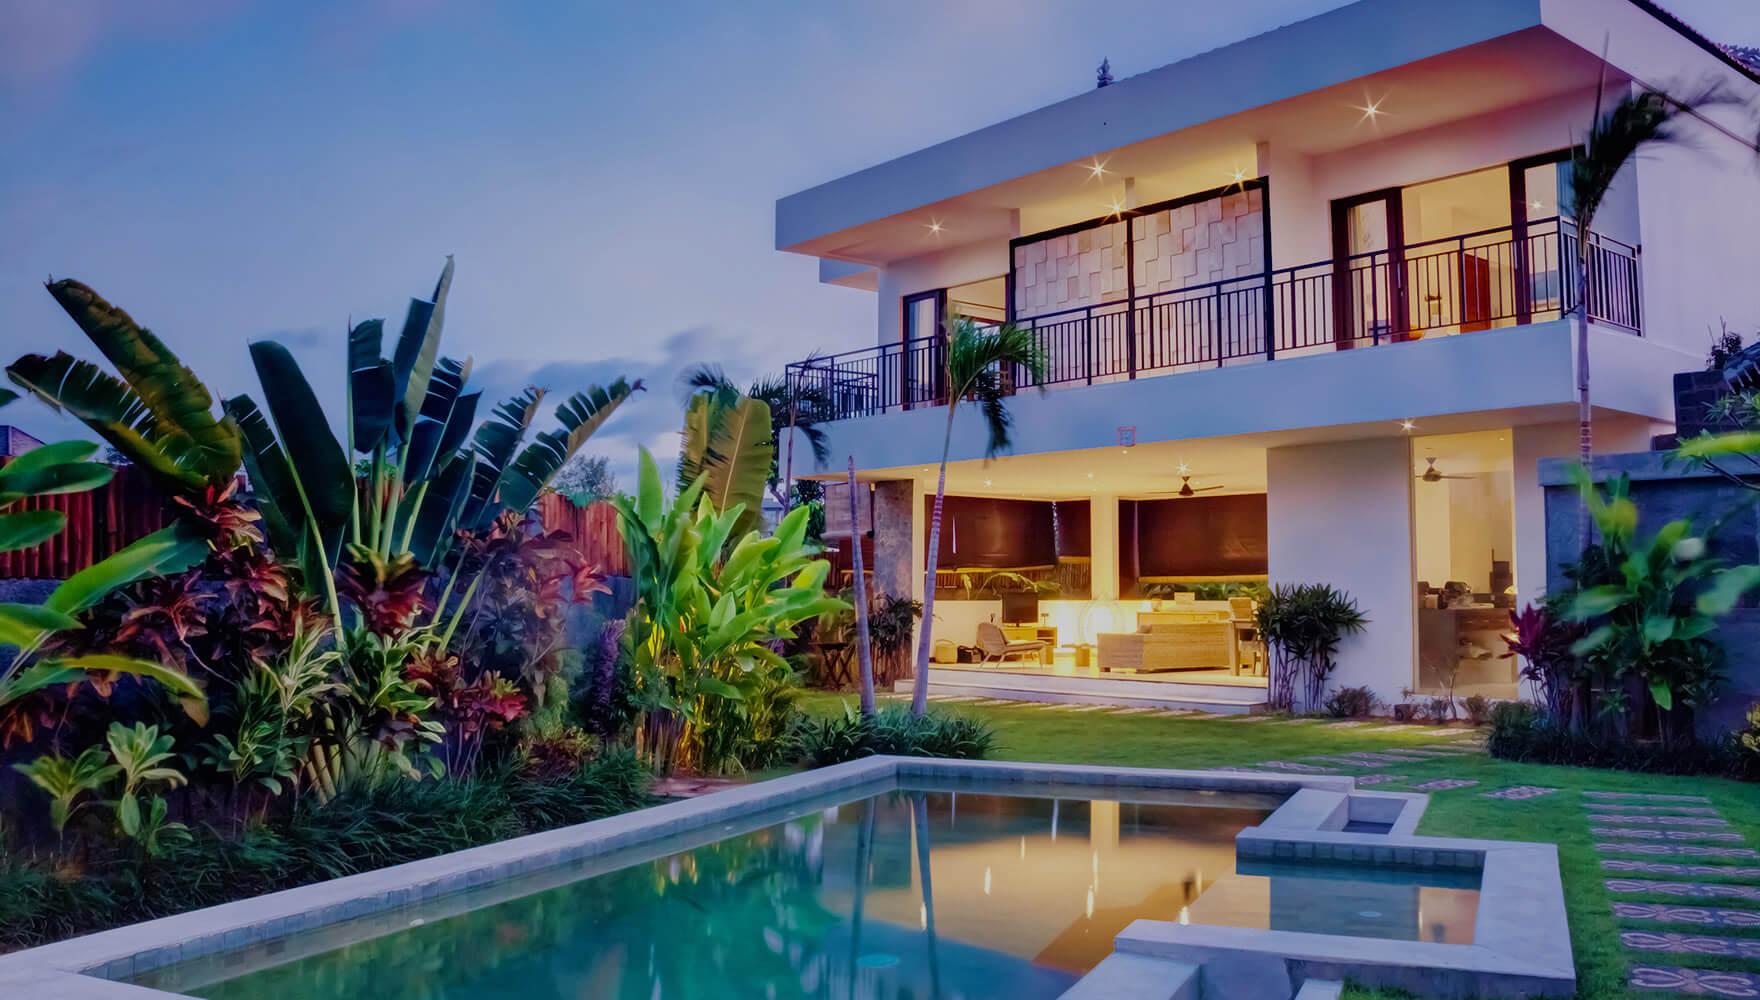 Property management split